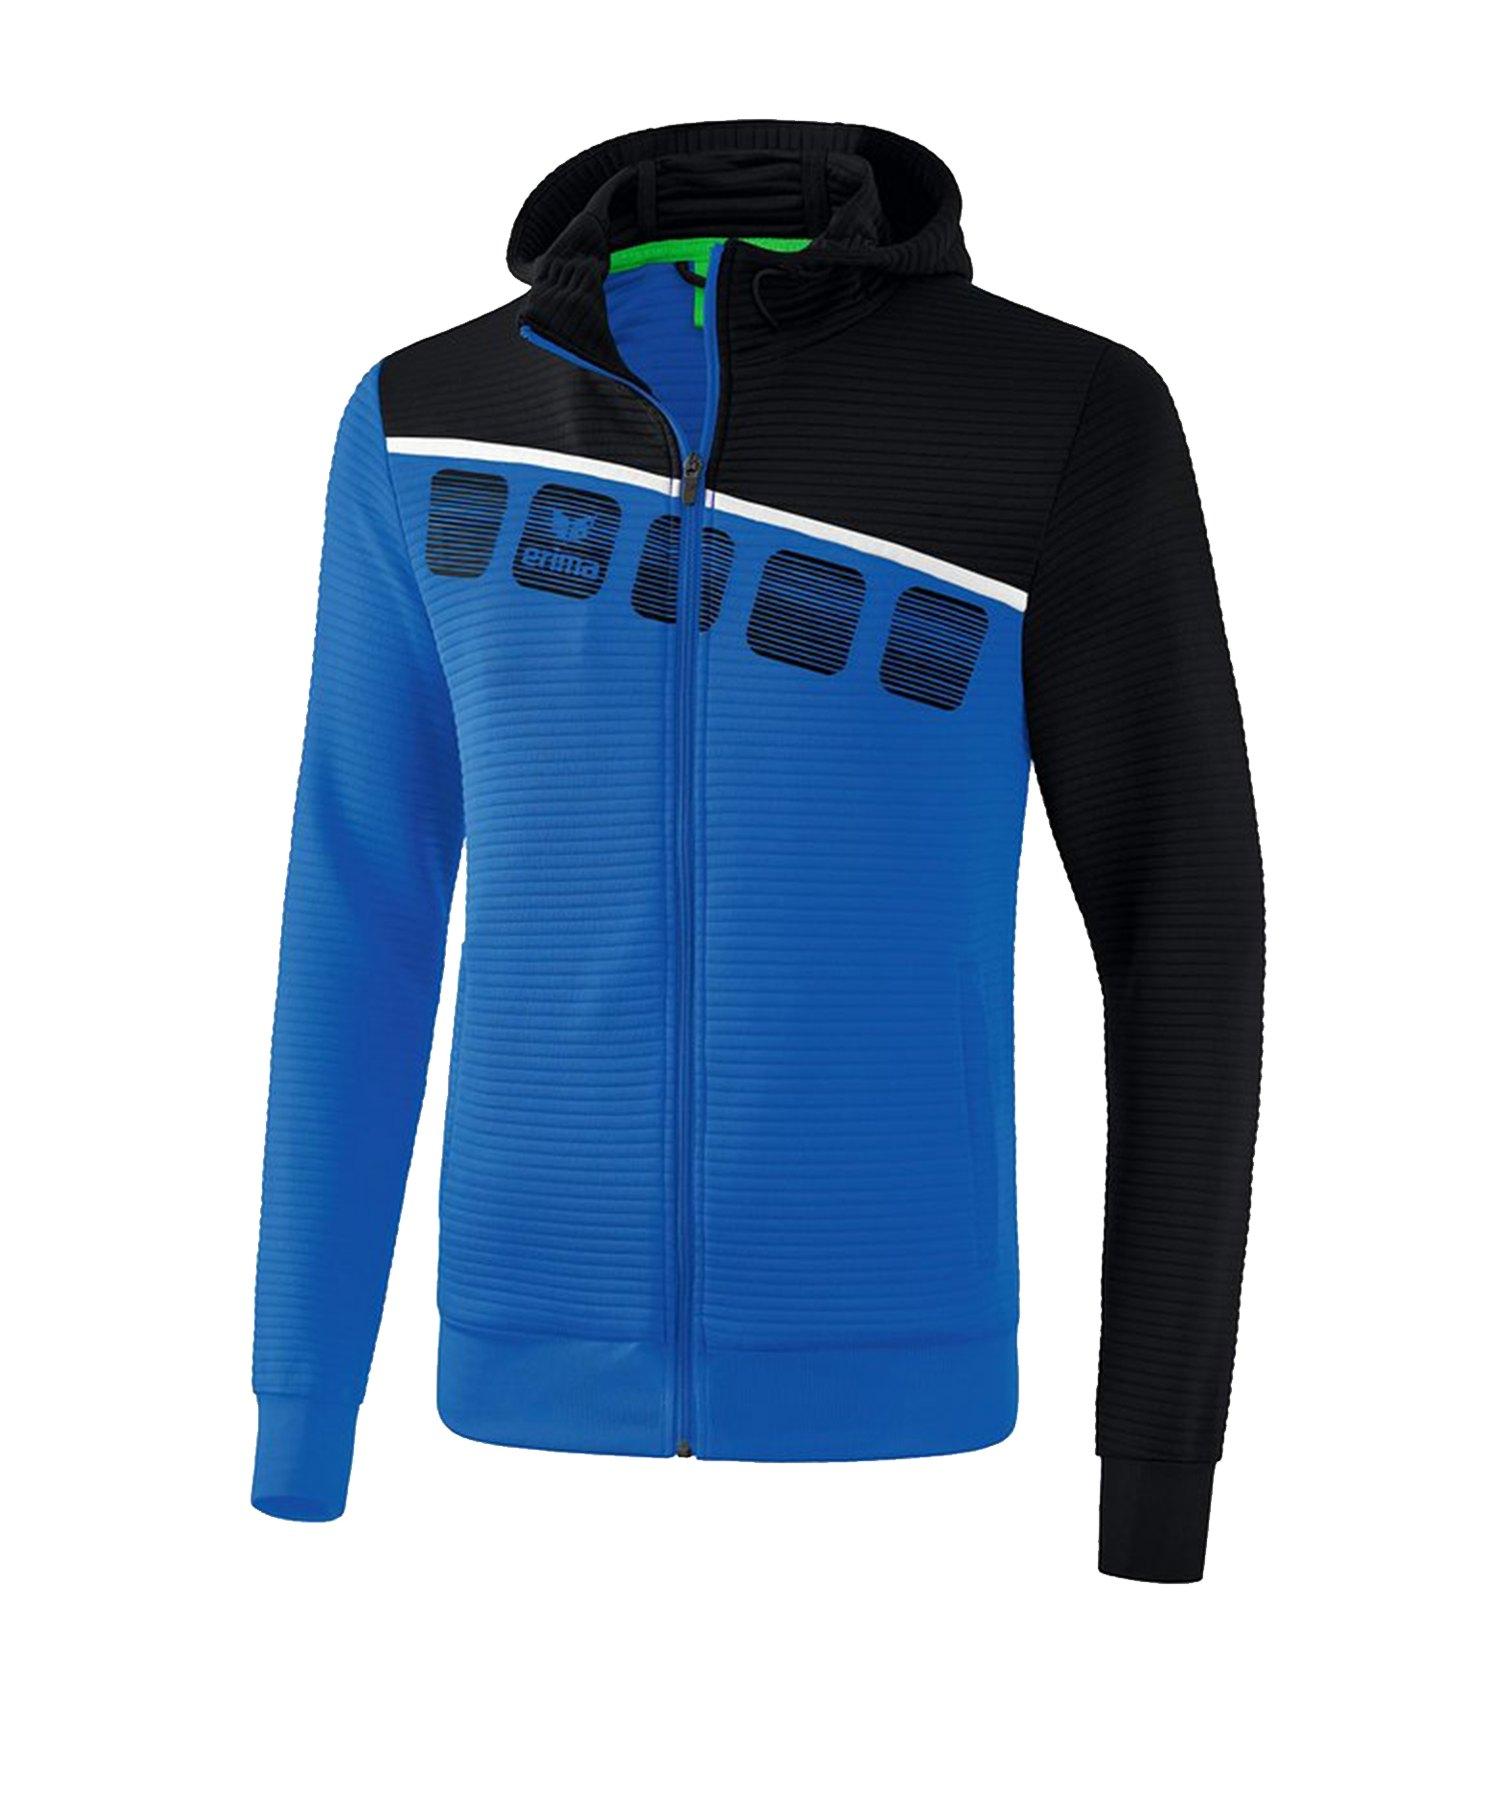 Erima 5-C Trainingsjacke mit Kapuze Blau Schwarz - Blau